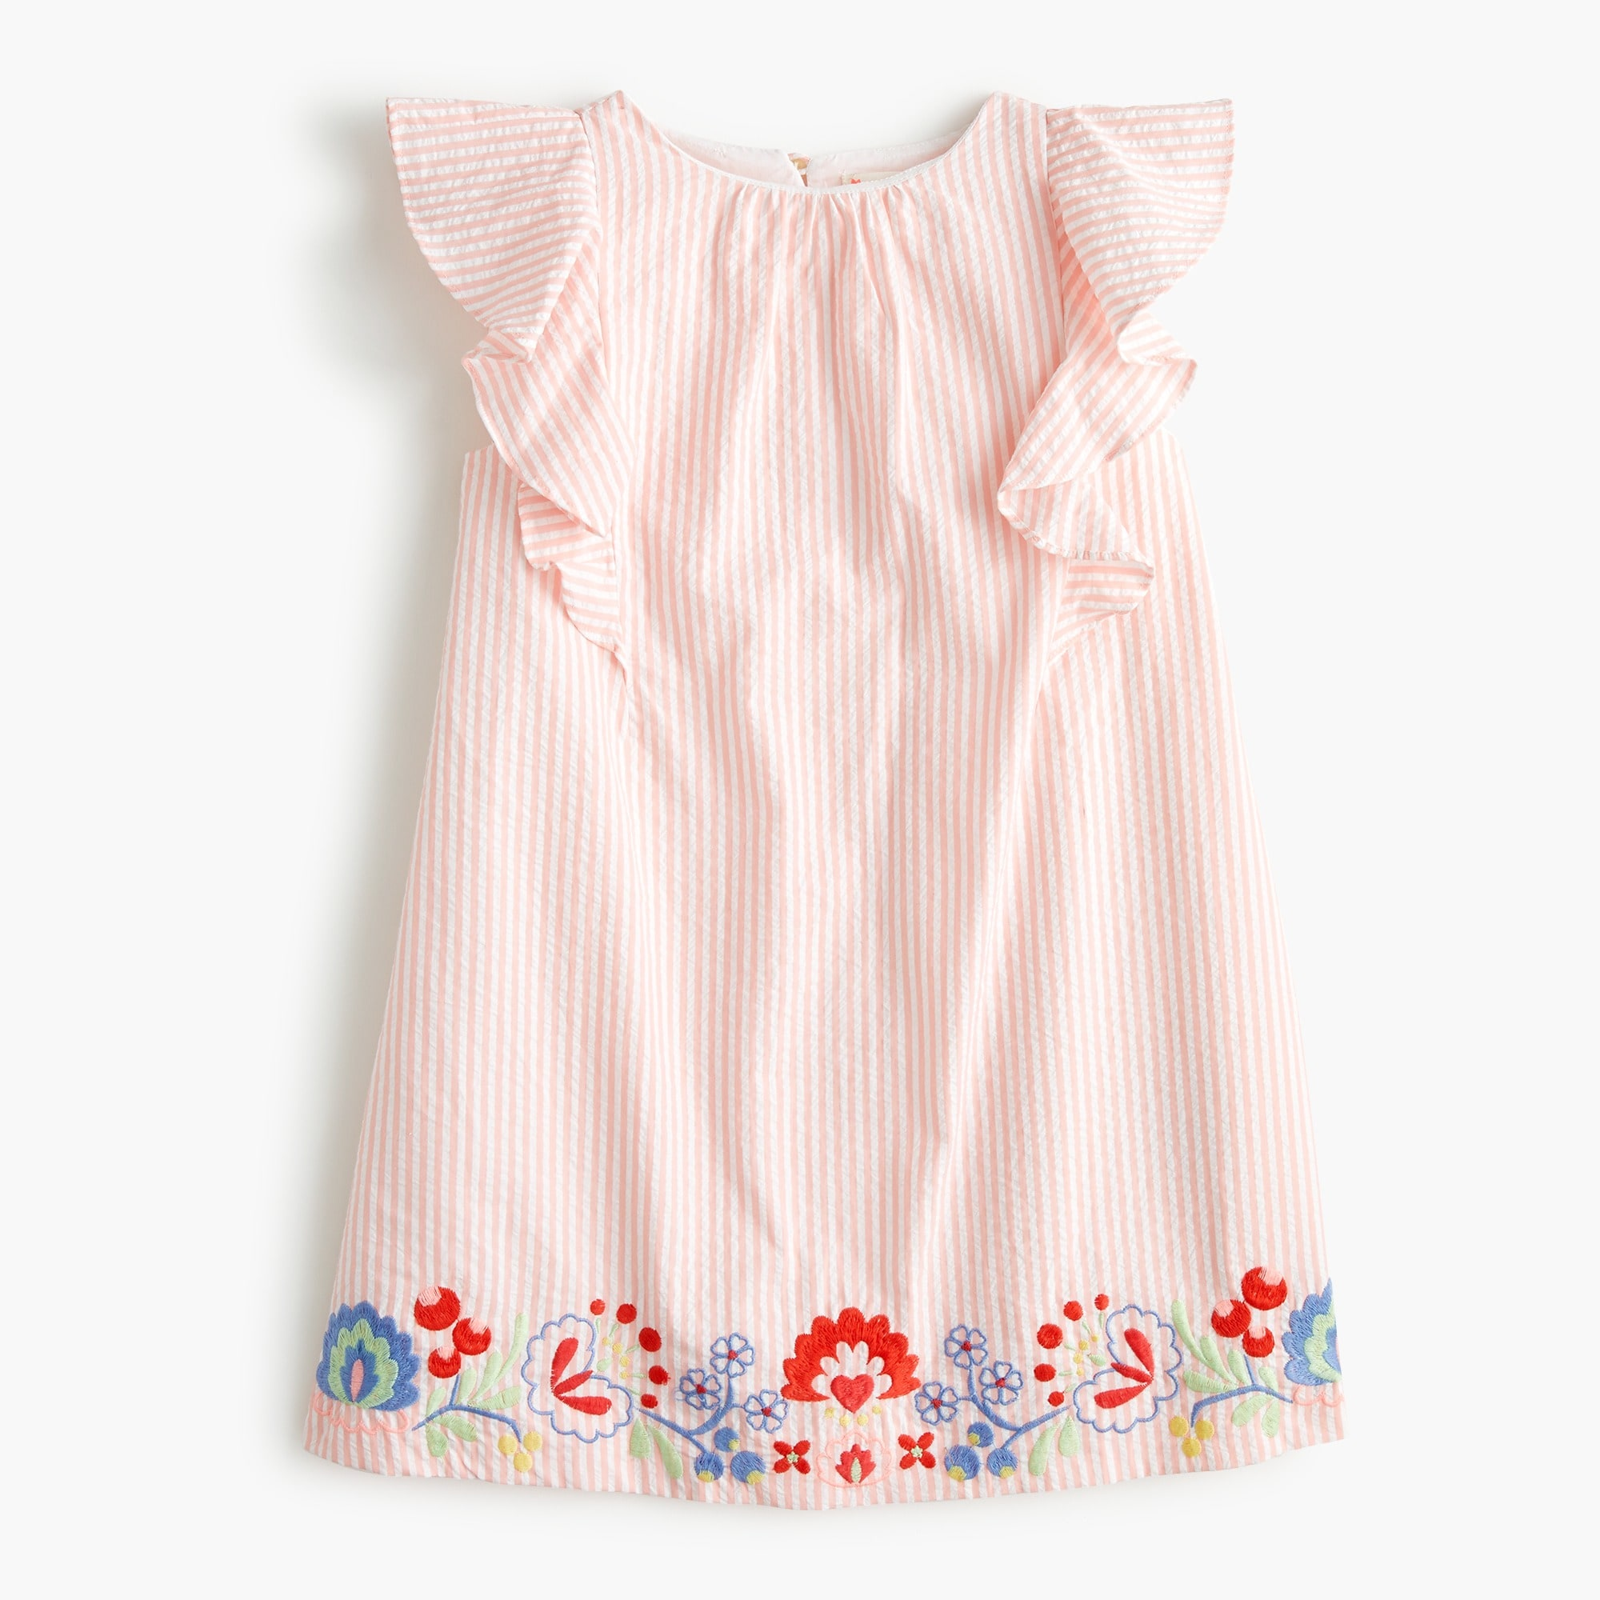 Girls' embroidered dress in seersucker